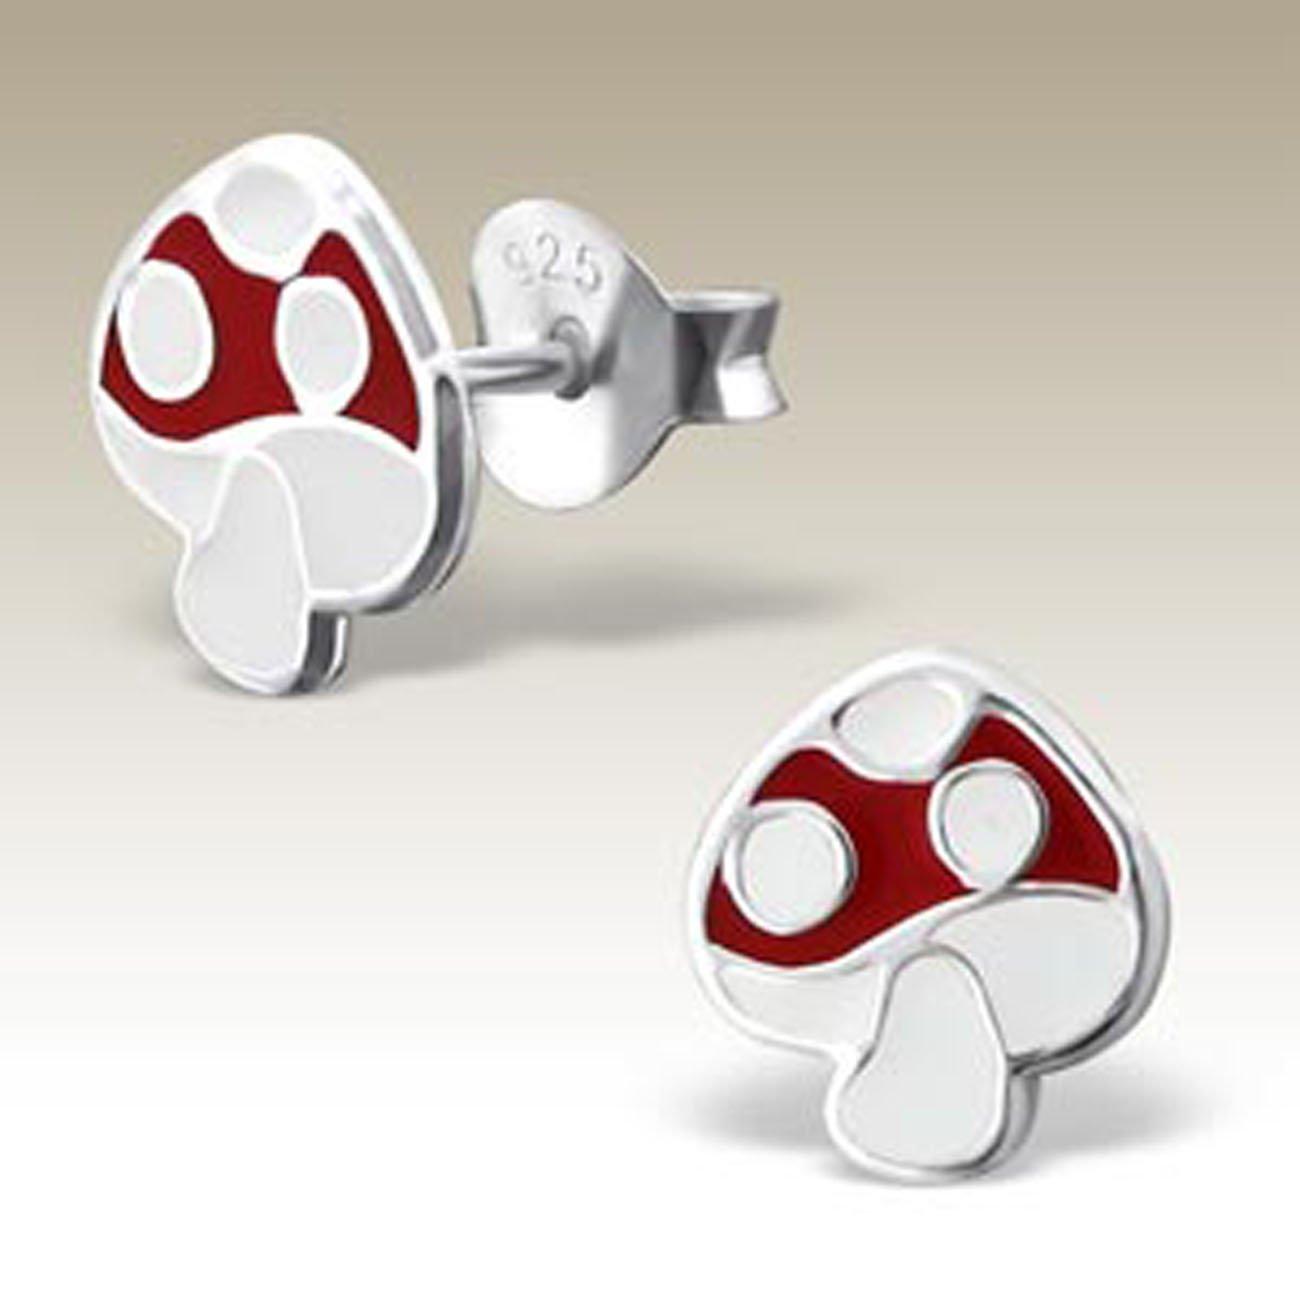 Kids Earrings Mushroom Ear Studs Stering Silver, E17262 Girls Earring Children Silver Earrings